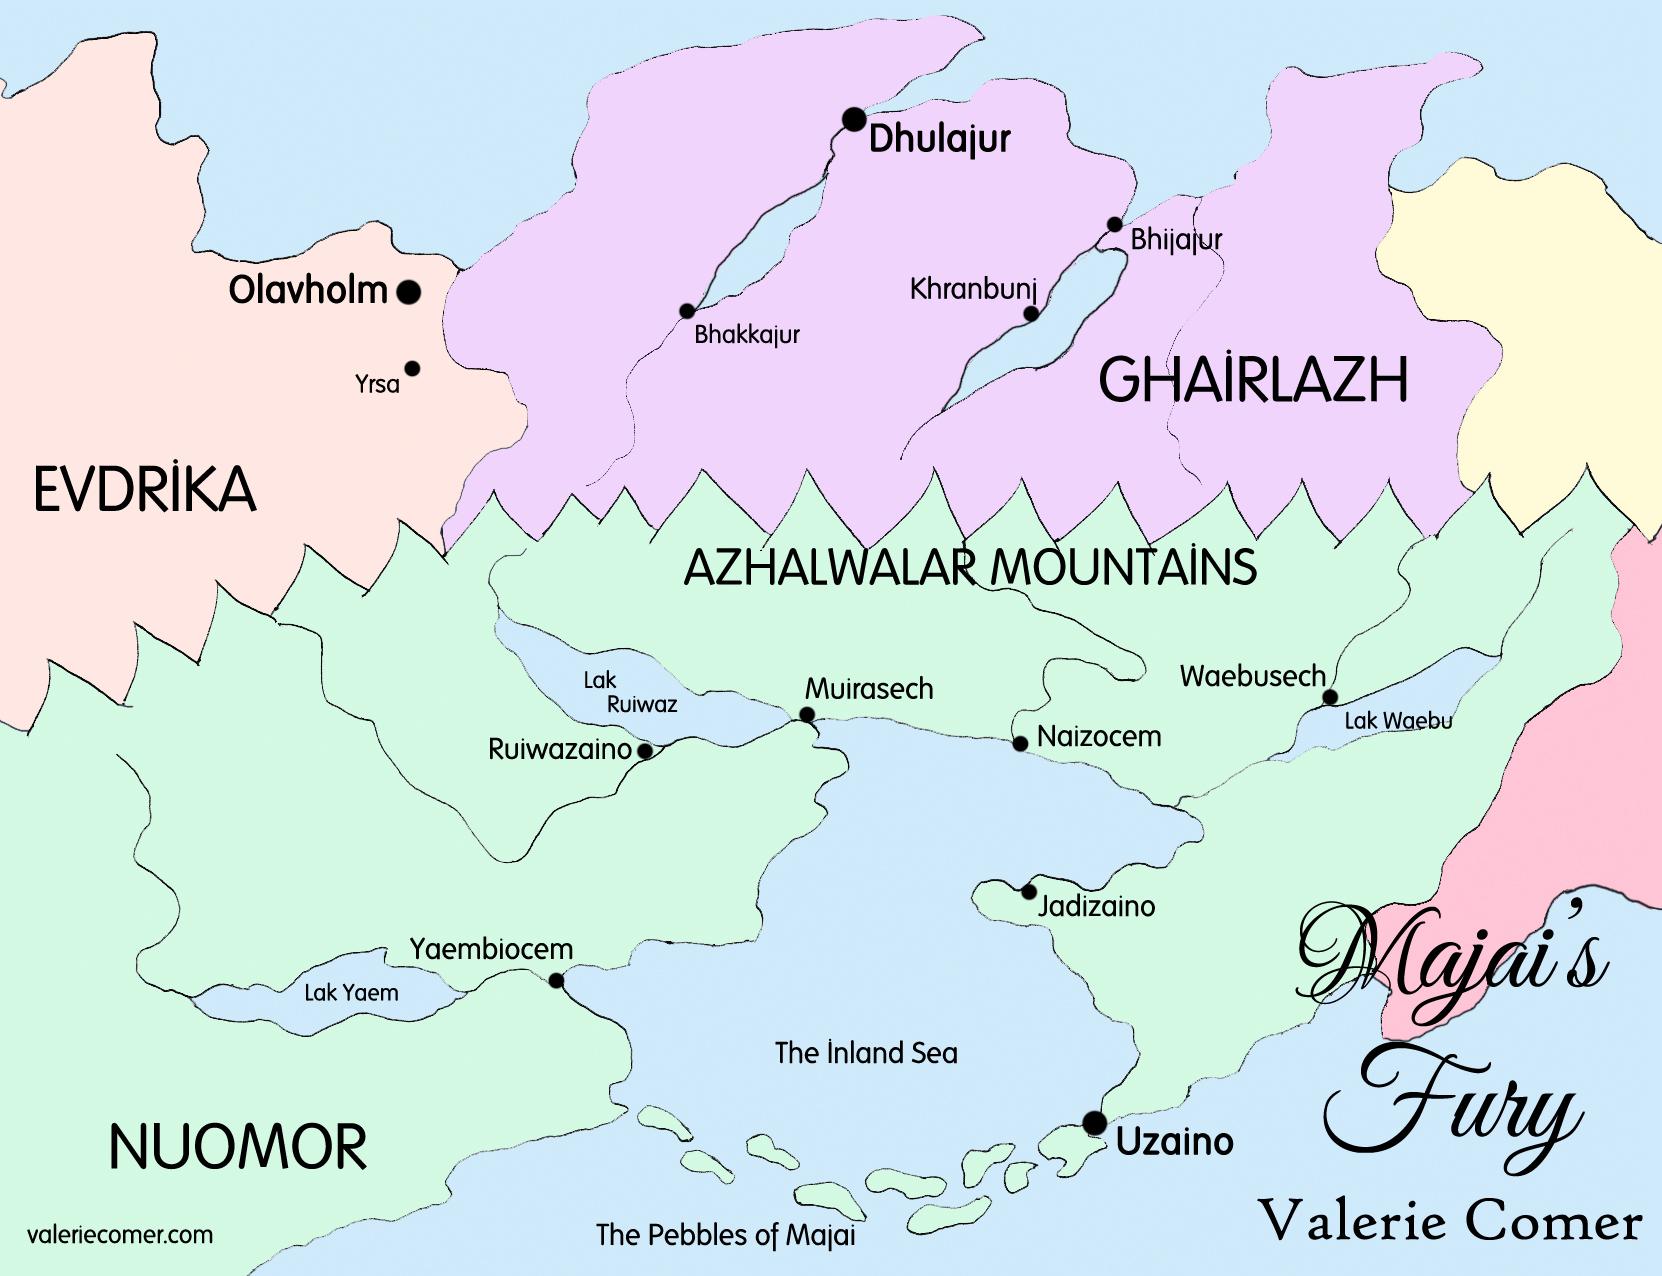 Majai's Fury, Lands of Azhalawar, Valerie Comer